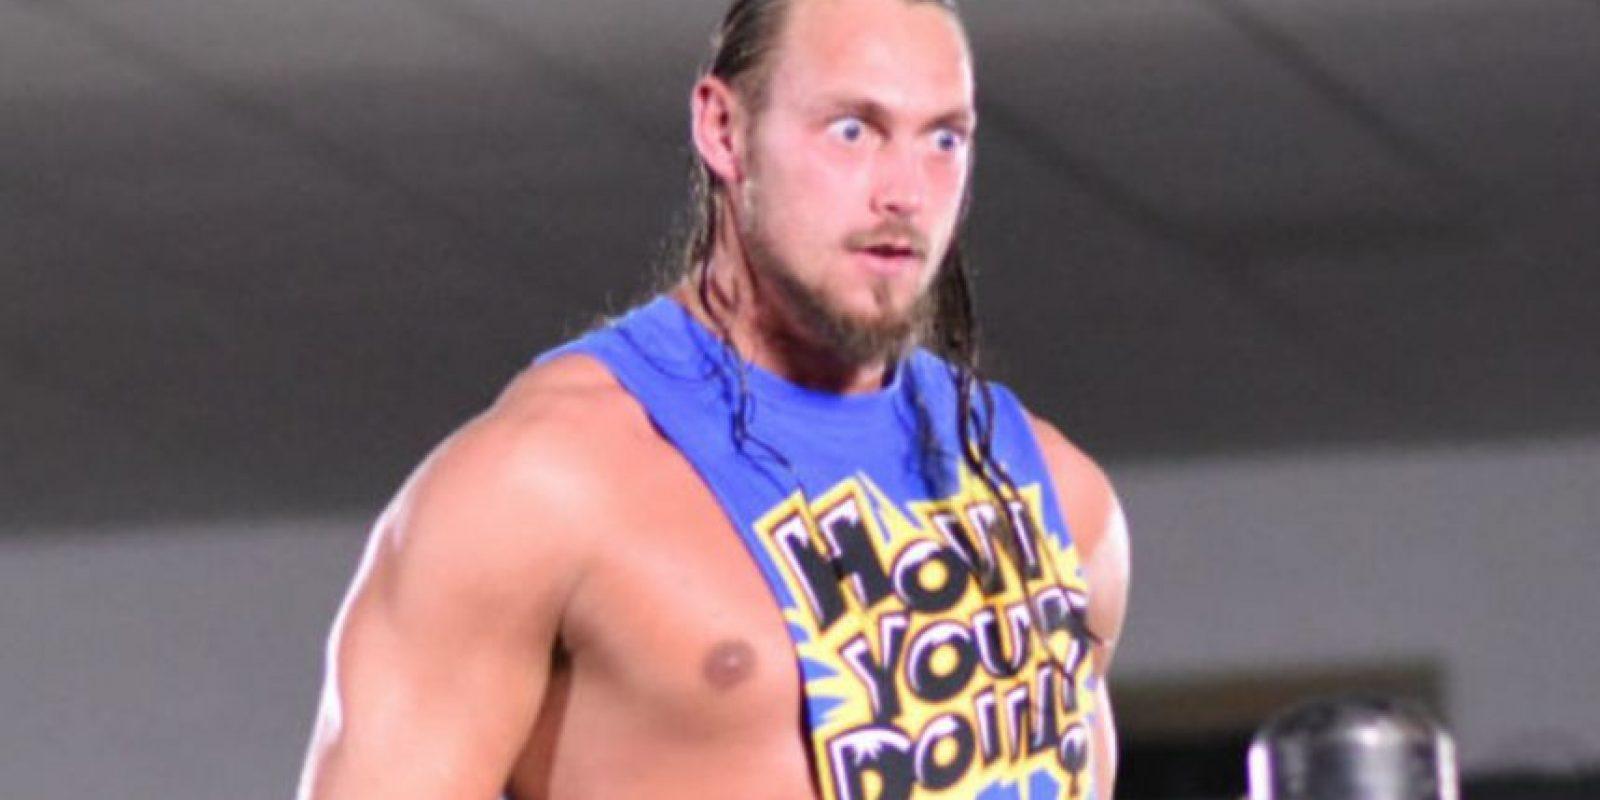 Big Cass es un gran fanático de Nightwish Foto:WWE